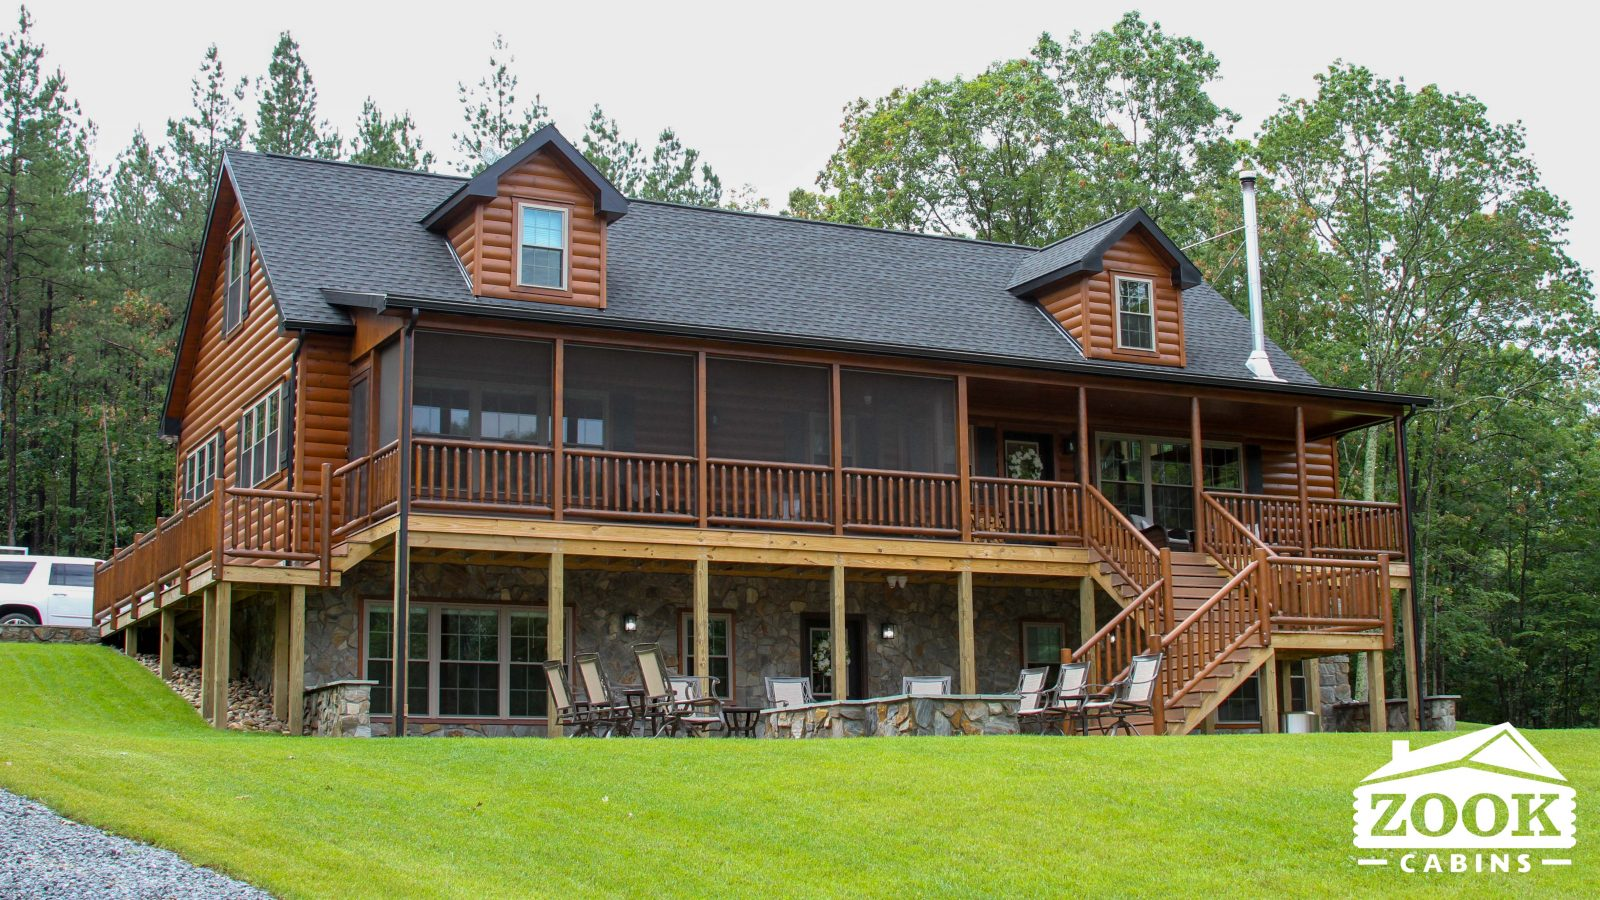 Modular log cabin in virginia that you will love